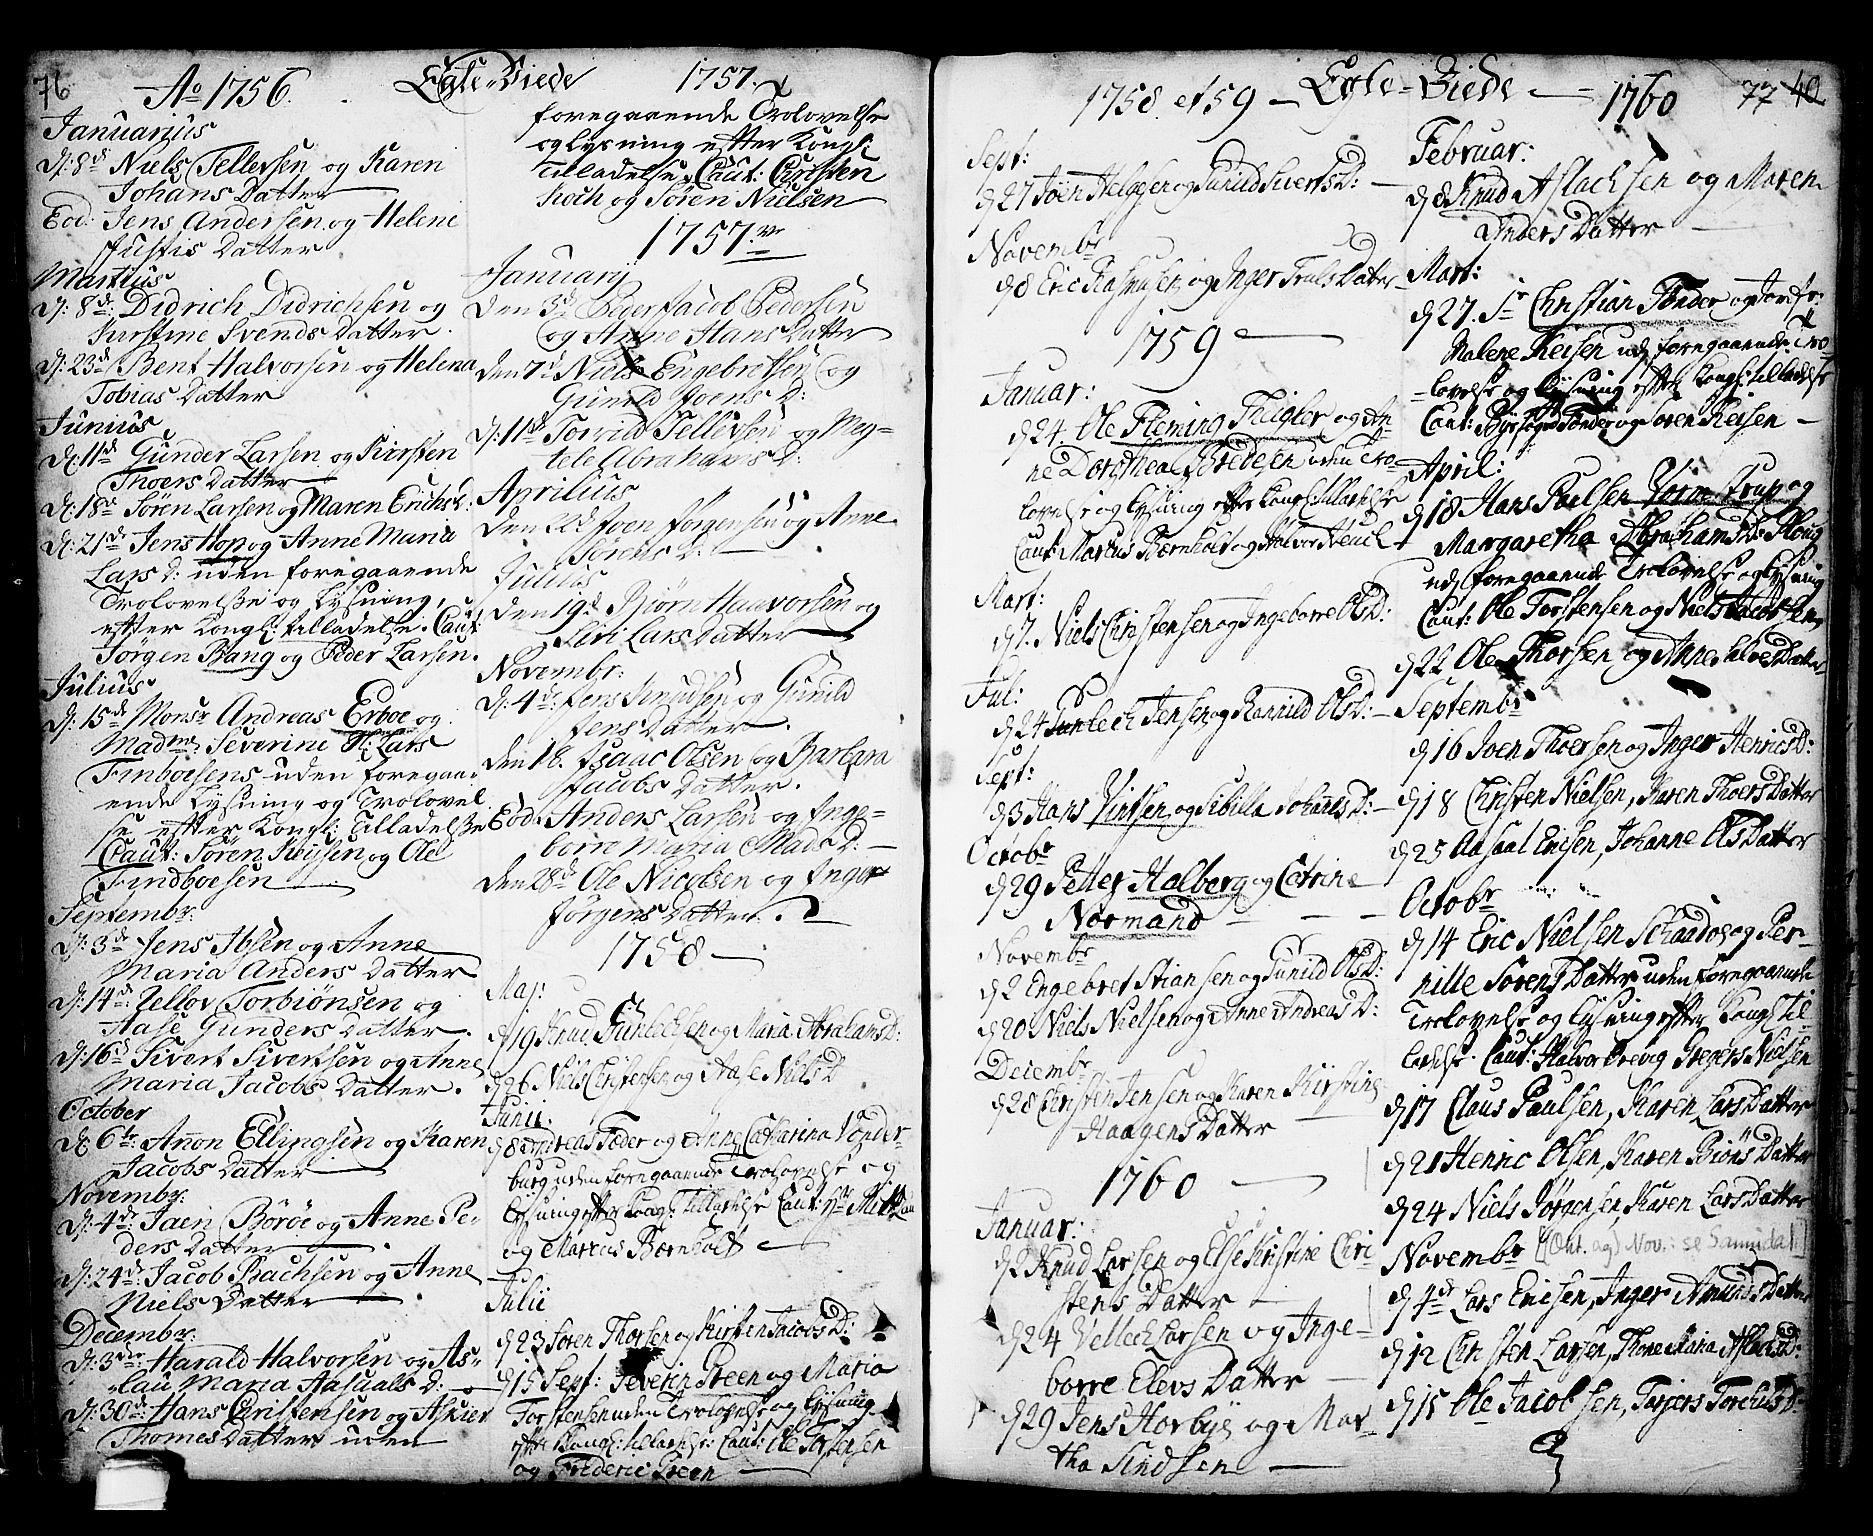 SAKO, Kragerø kirkebøker, F/Fa/L0001: Ministerialbok nr. 1, 1702-1766, s. 76-77